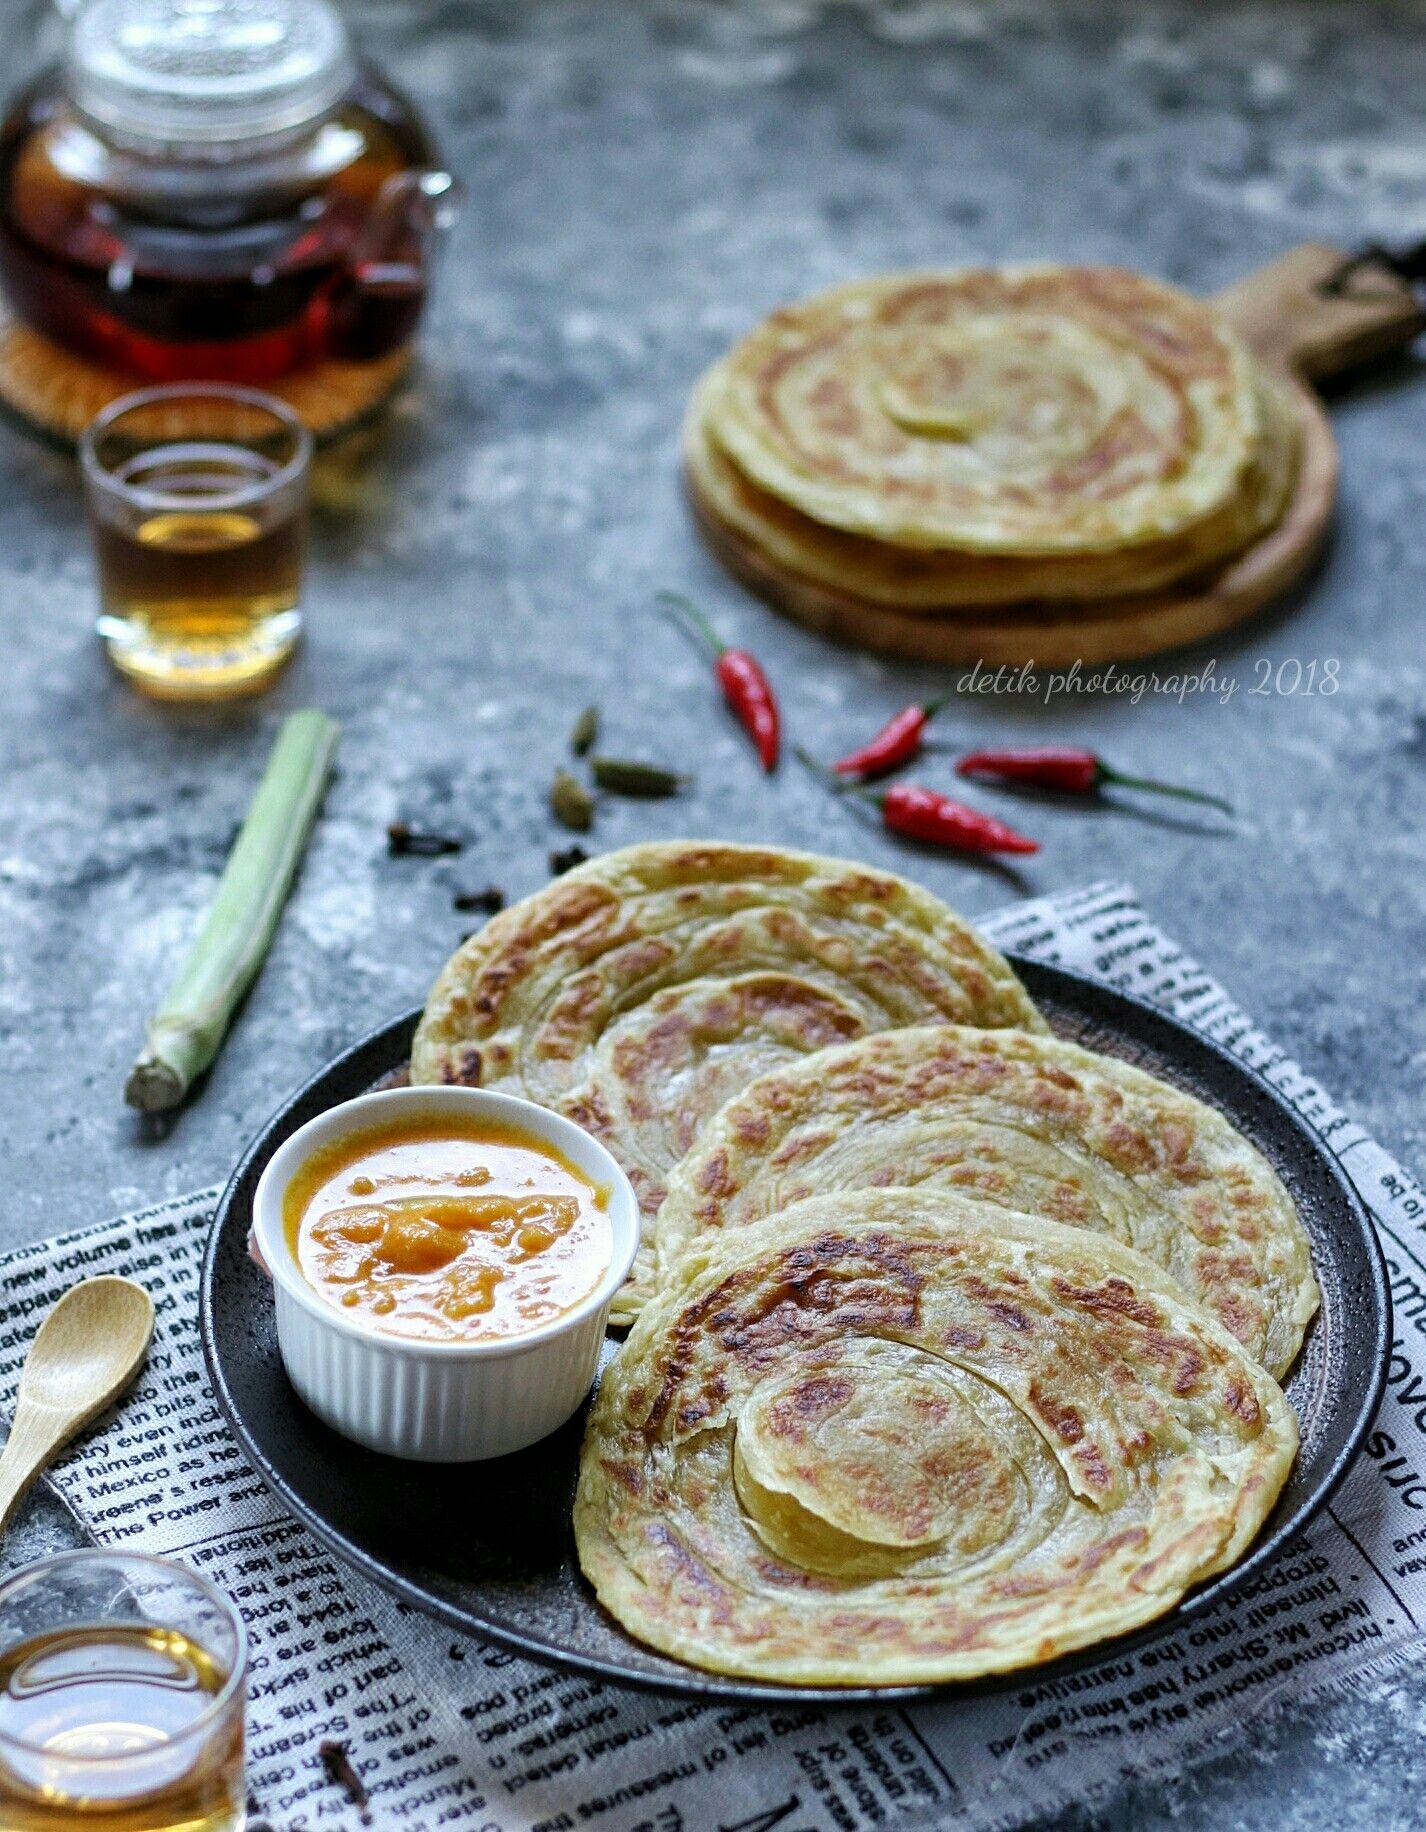 Roti Maryam Makanan Fotografi Makanan Resep Masakan Indonesia